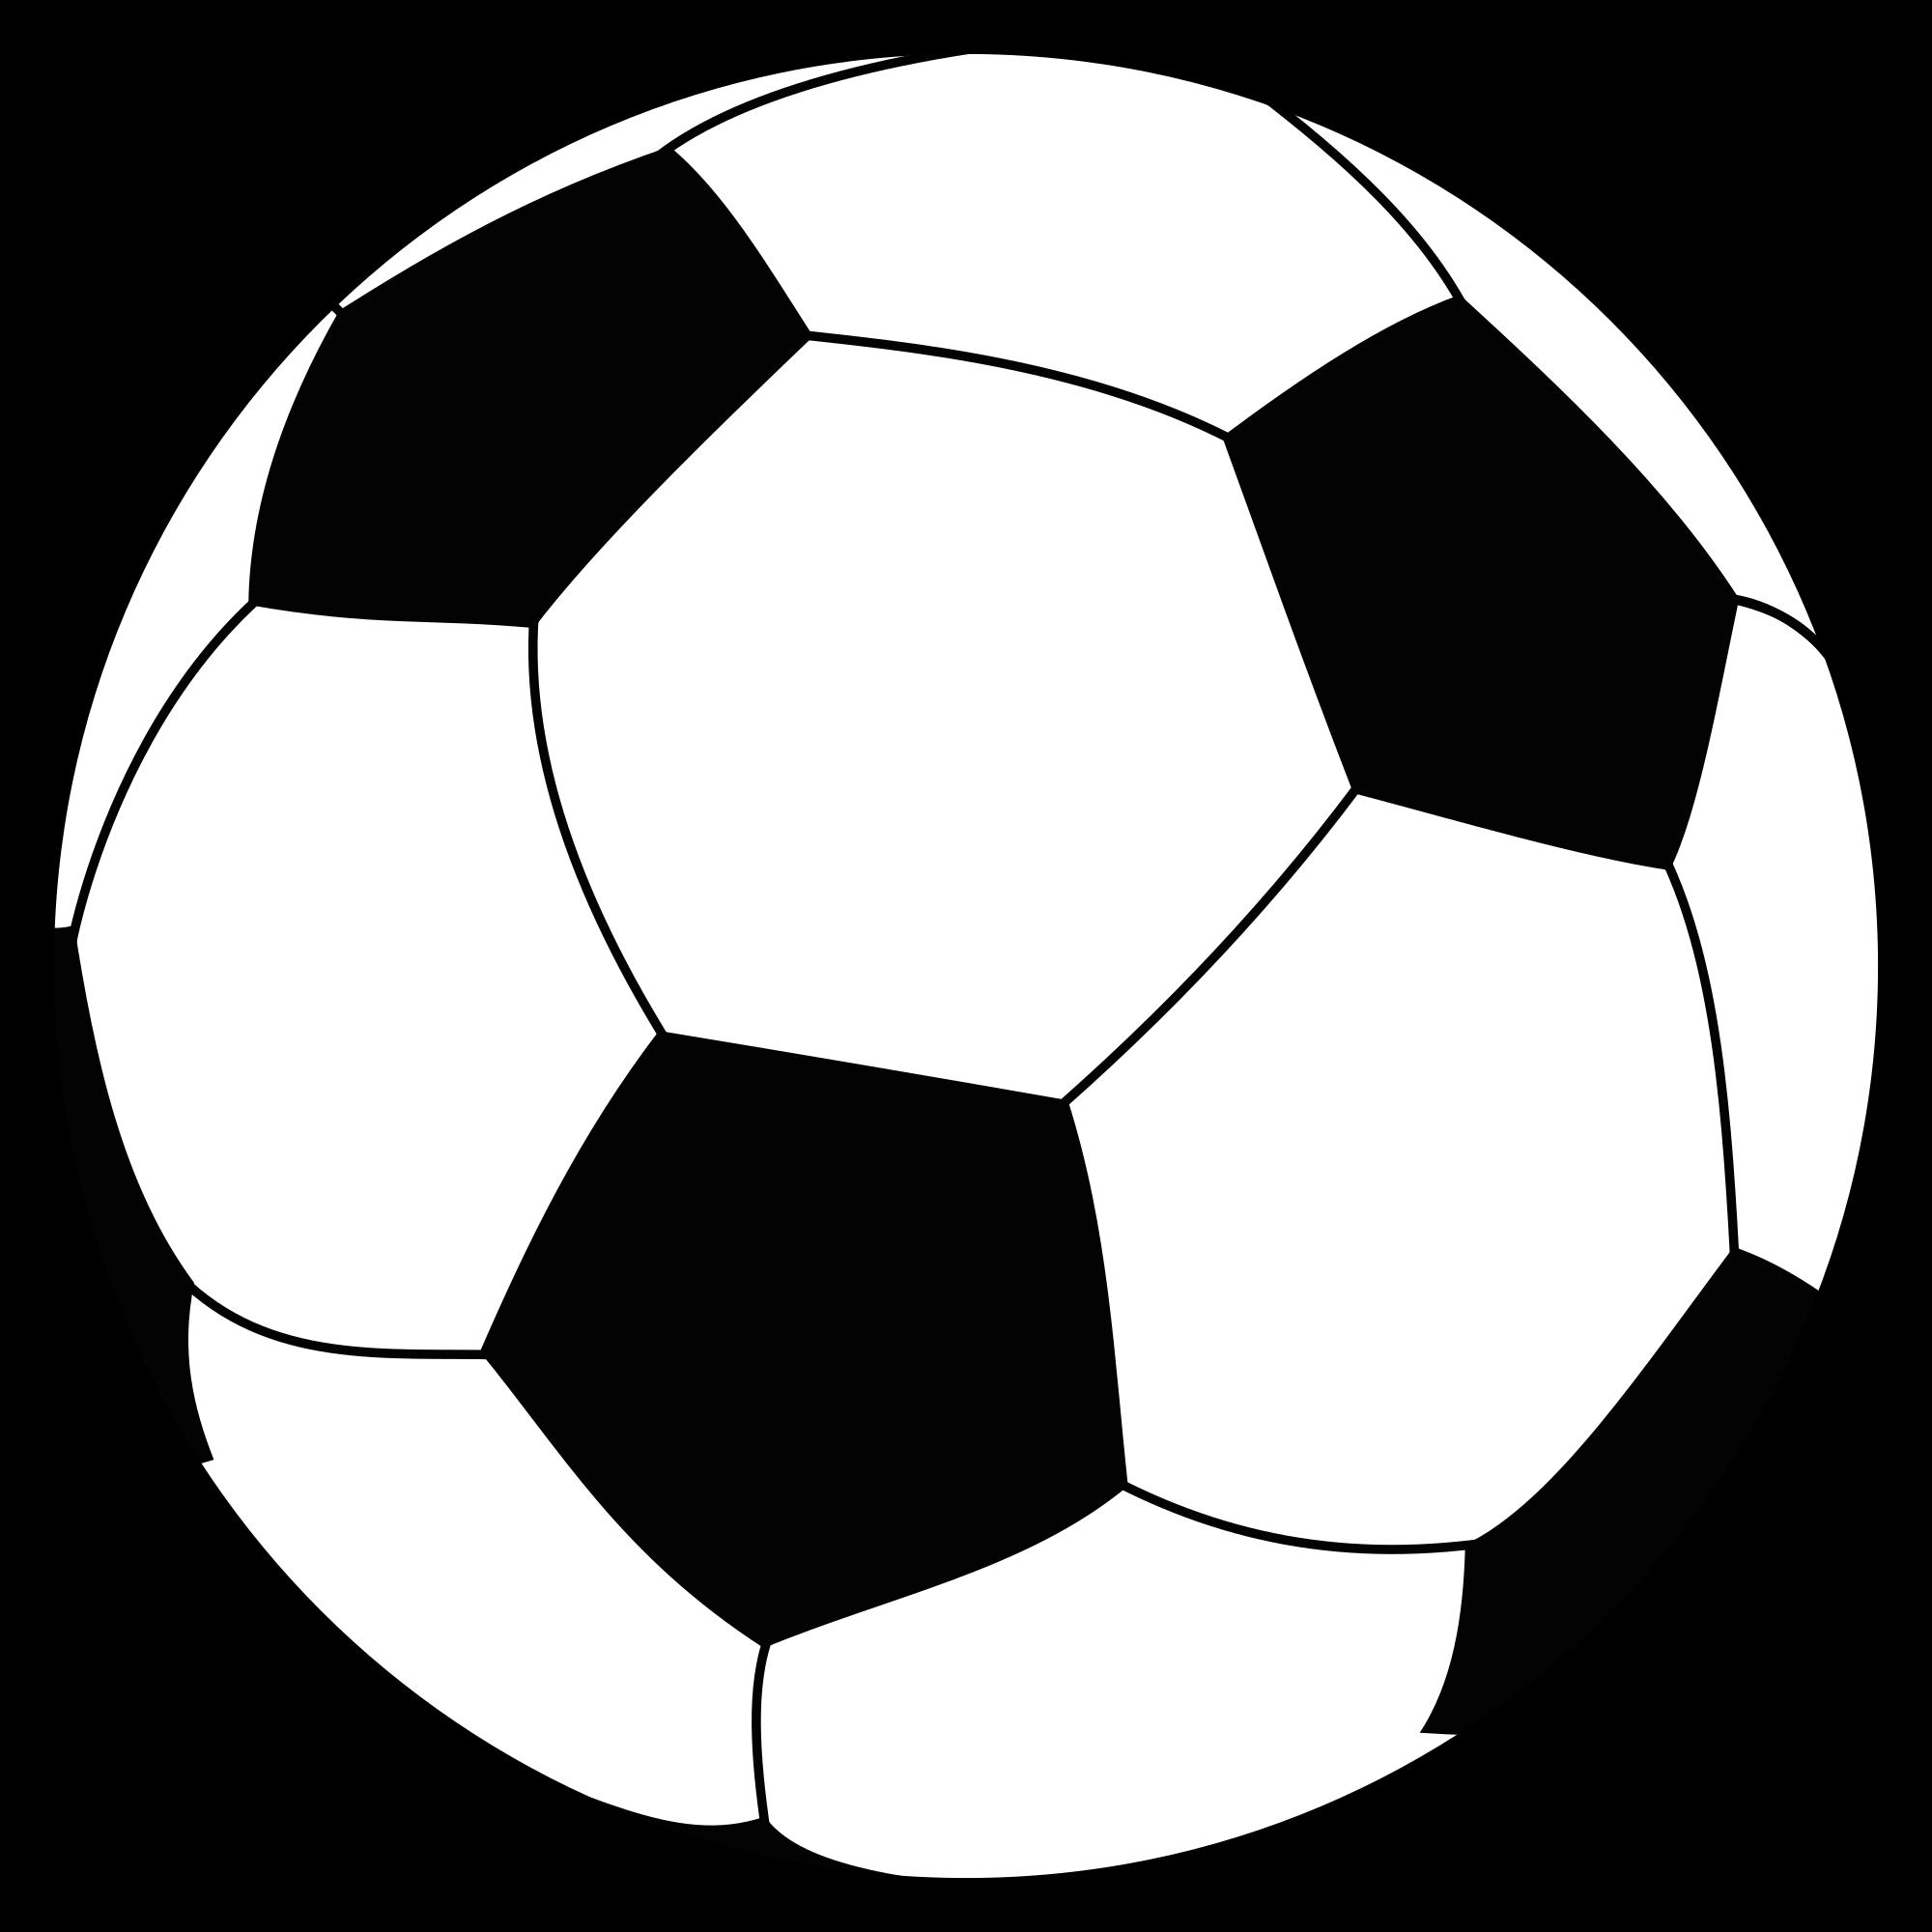 Fan clipart soccer ball, Fan soccer ball Transparent FREE.